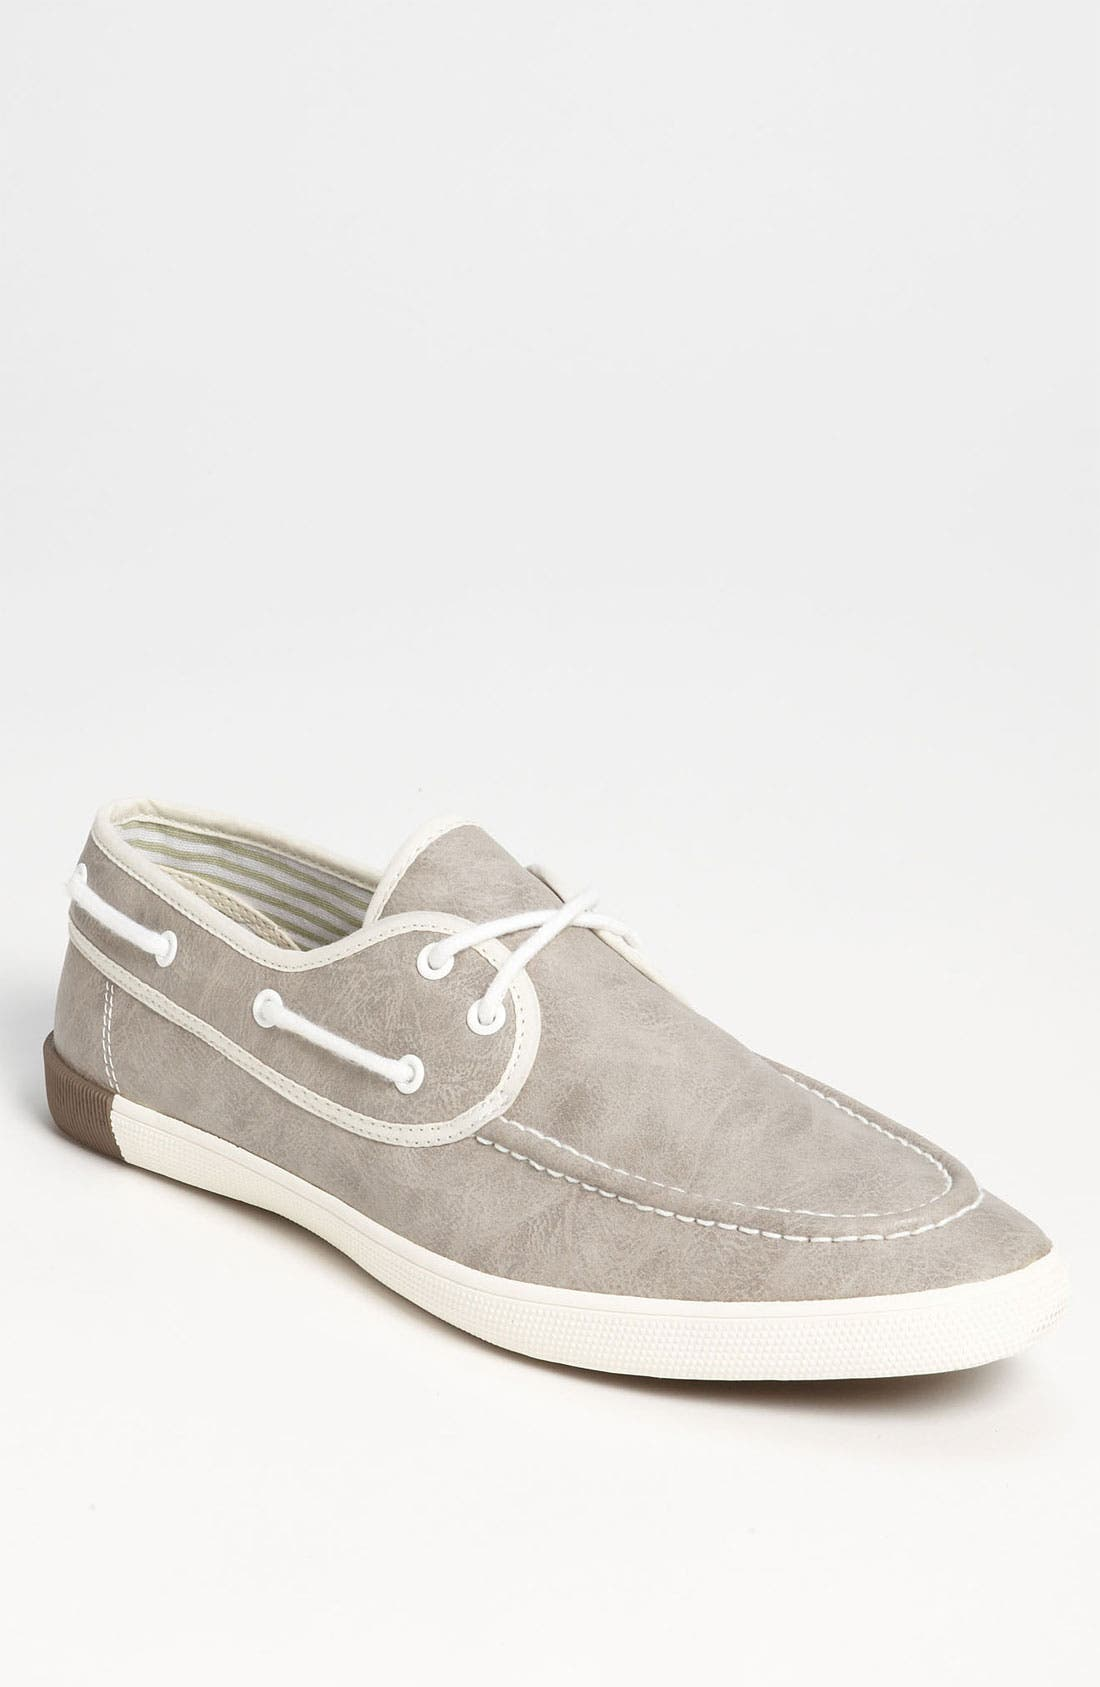 Main Image - ALDO 'Rowson' Boat Shoe